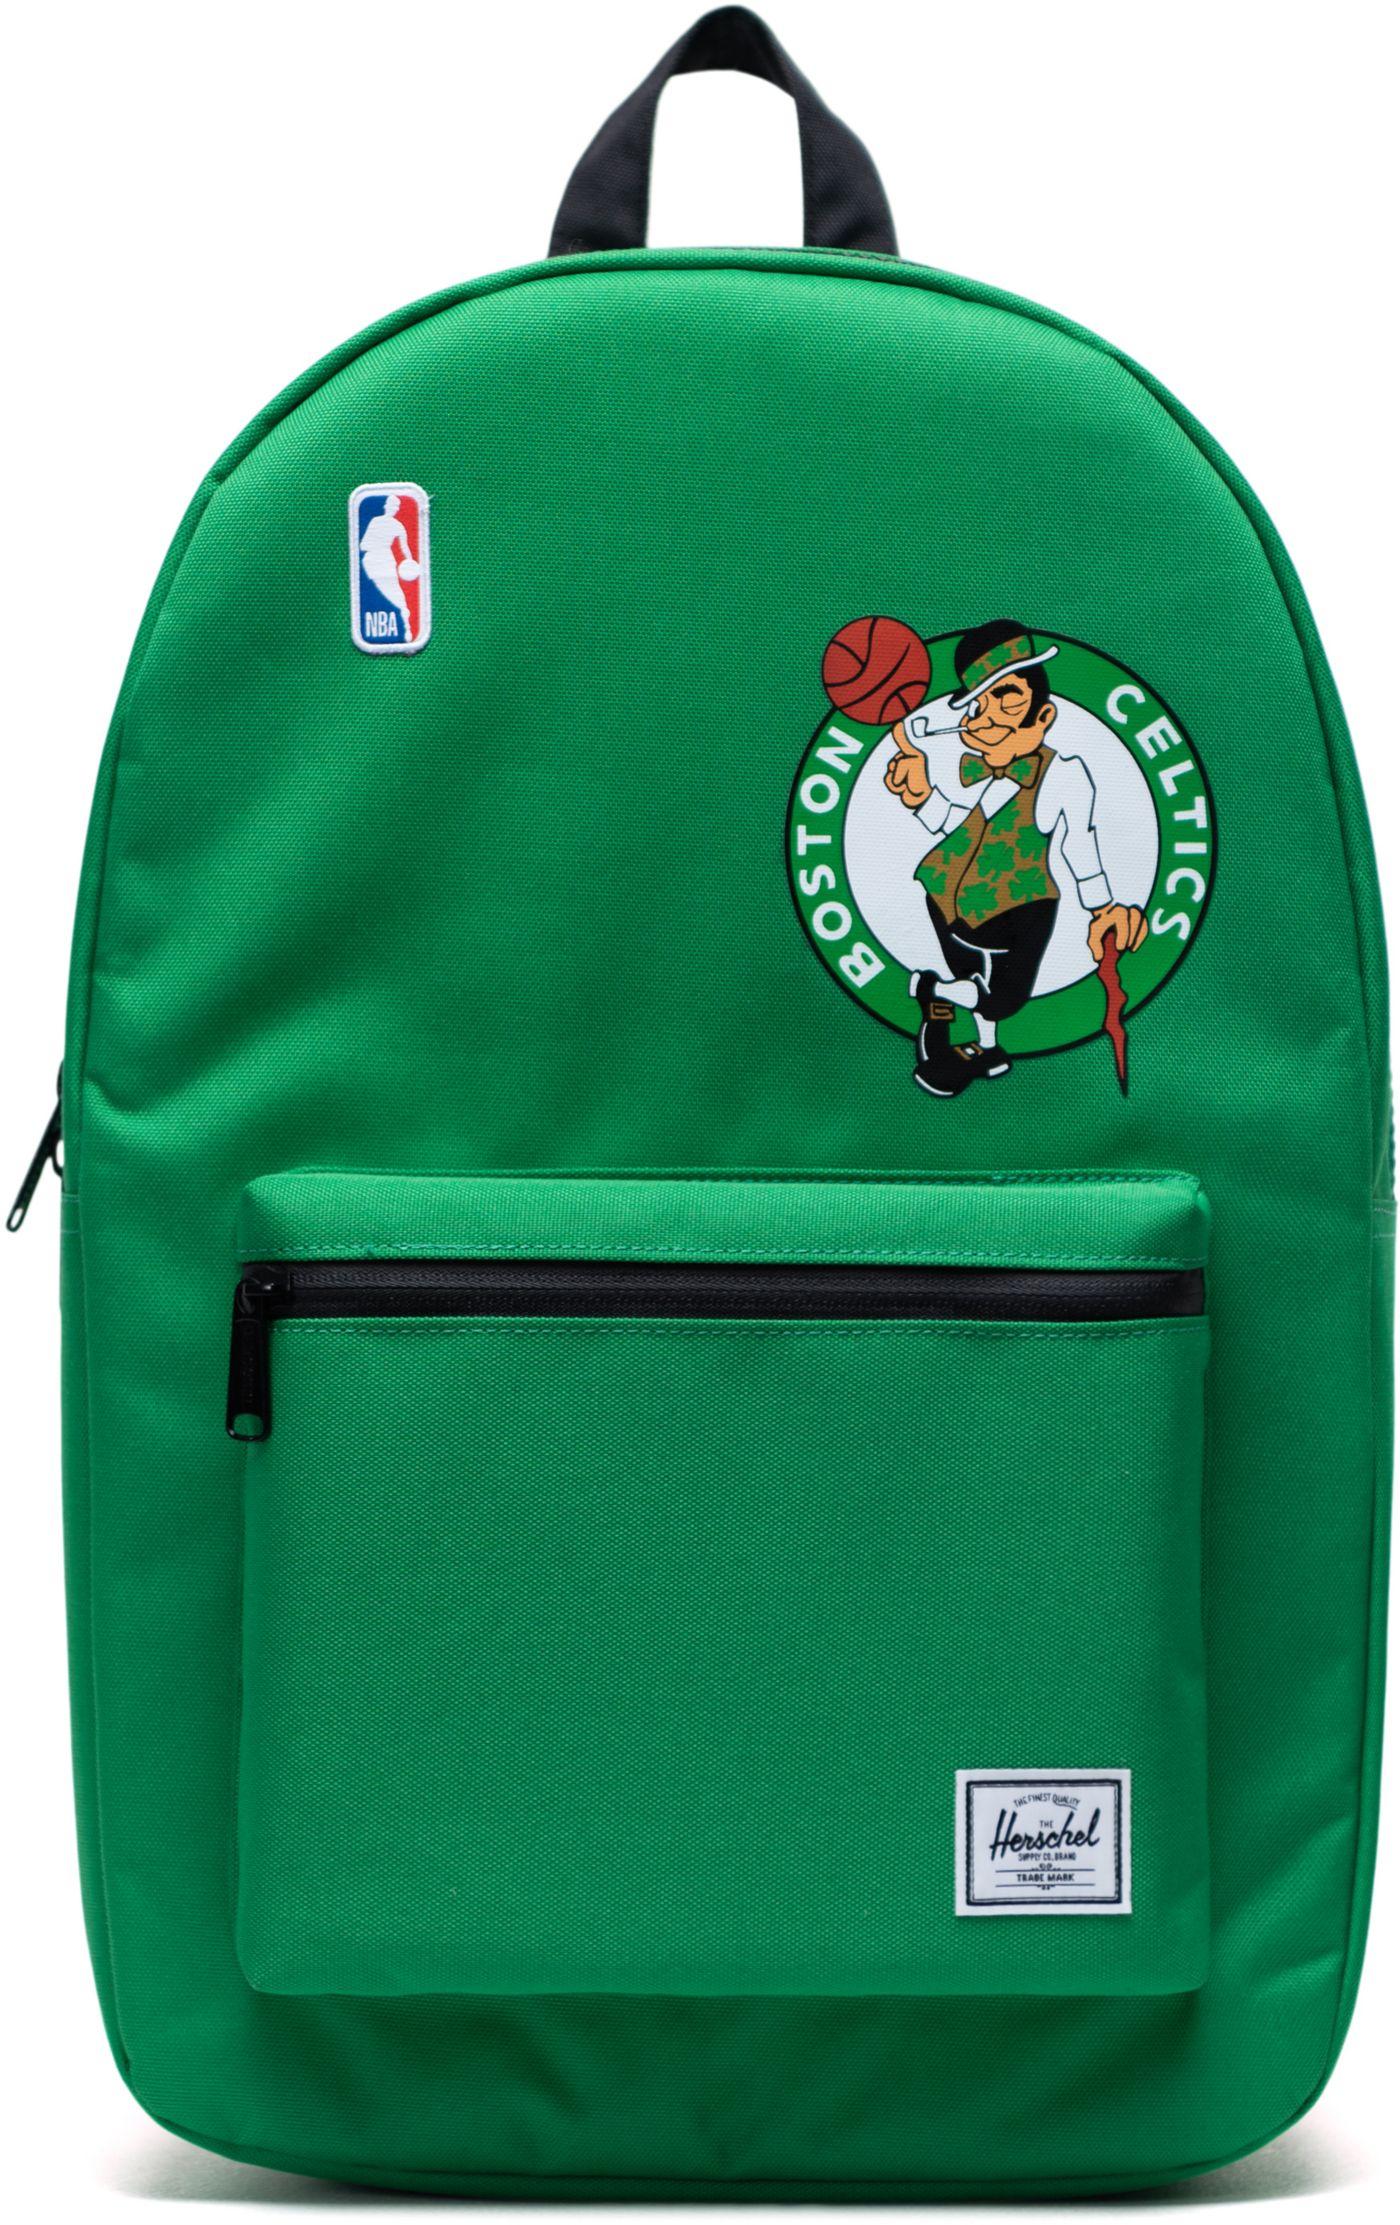 Herschel Boston Celtics Green Backpack